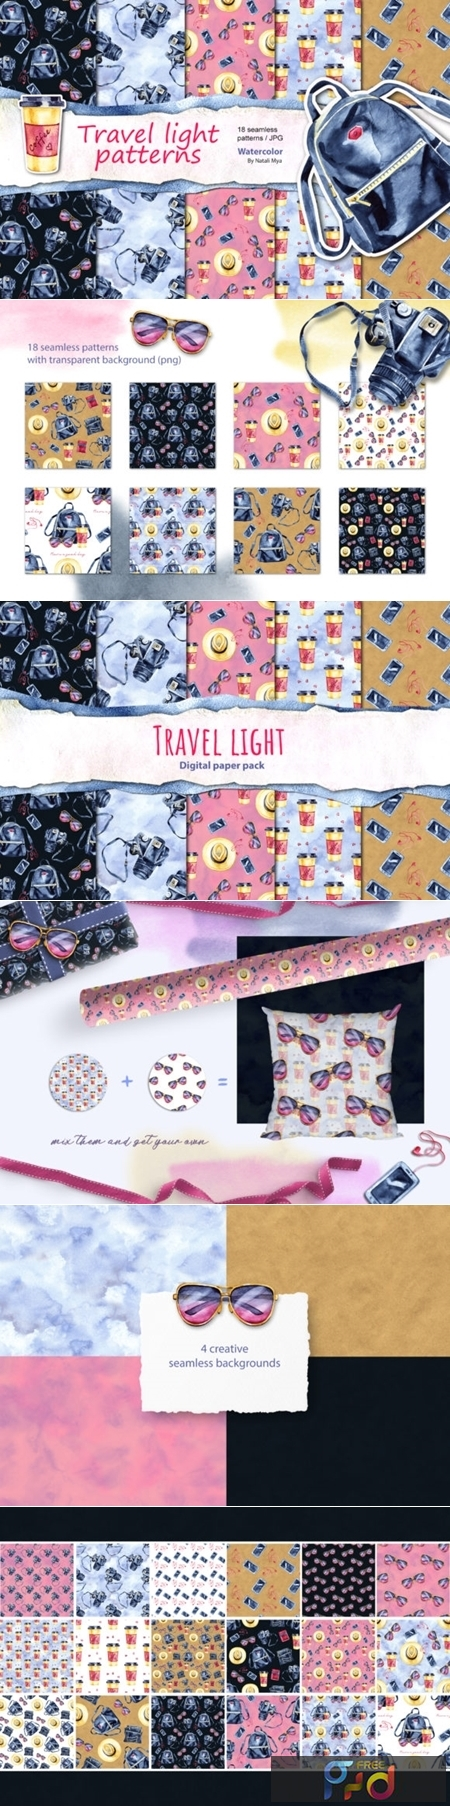 Travel Light - Seamless Patterns 3490273 1